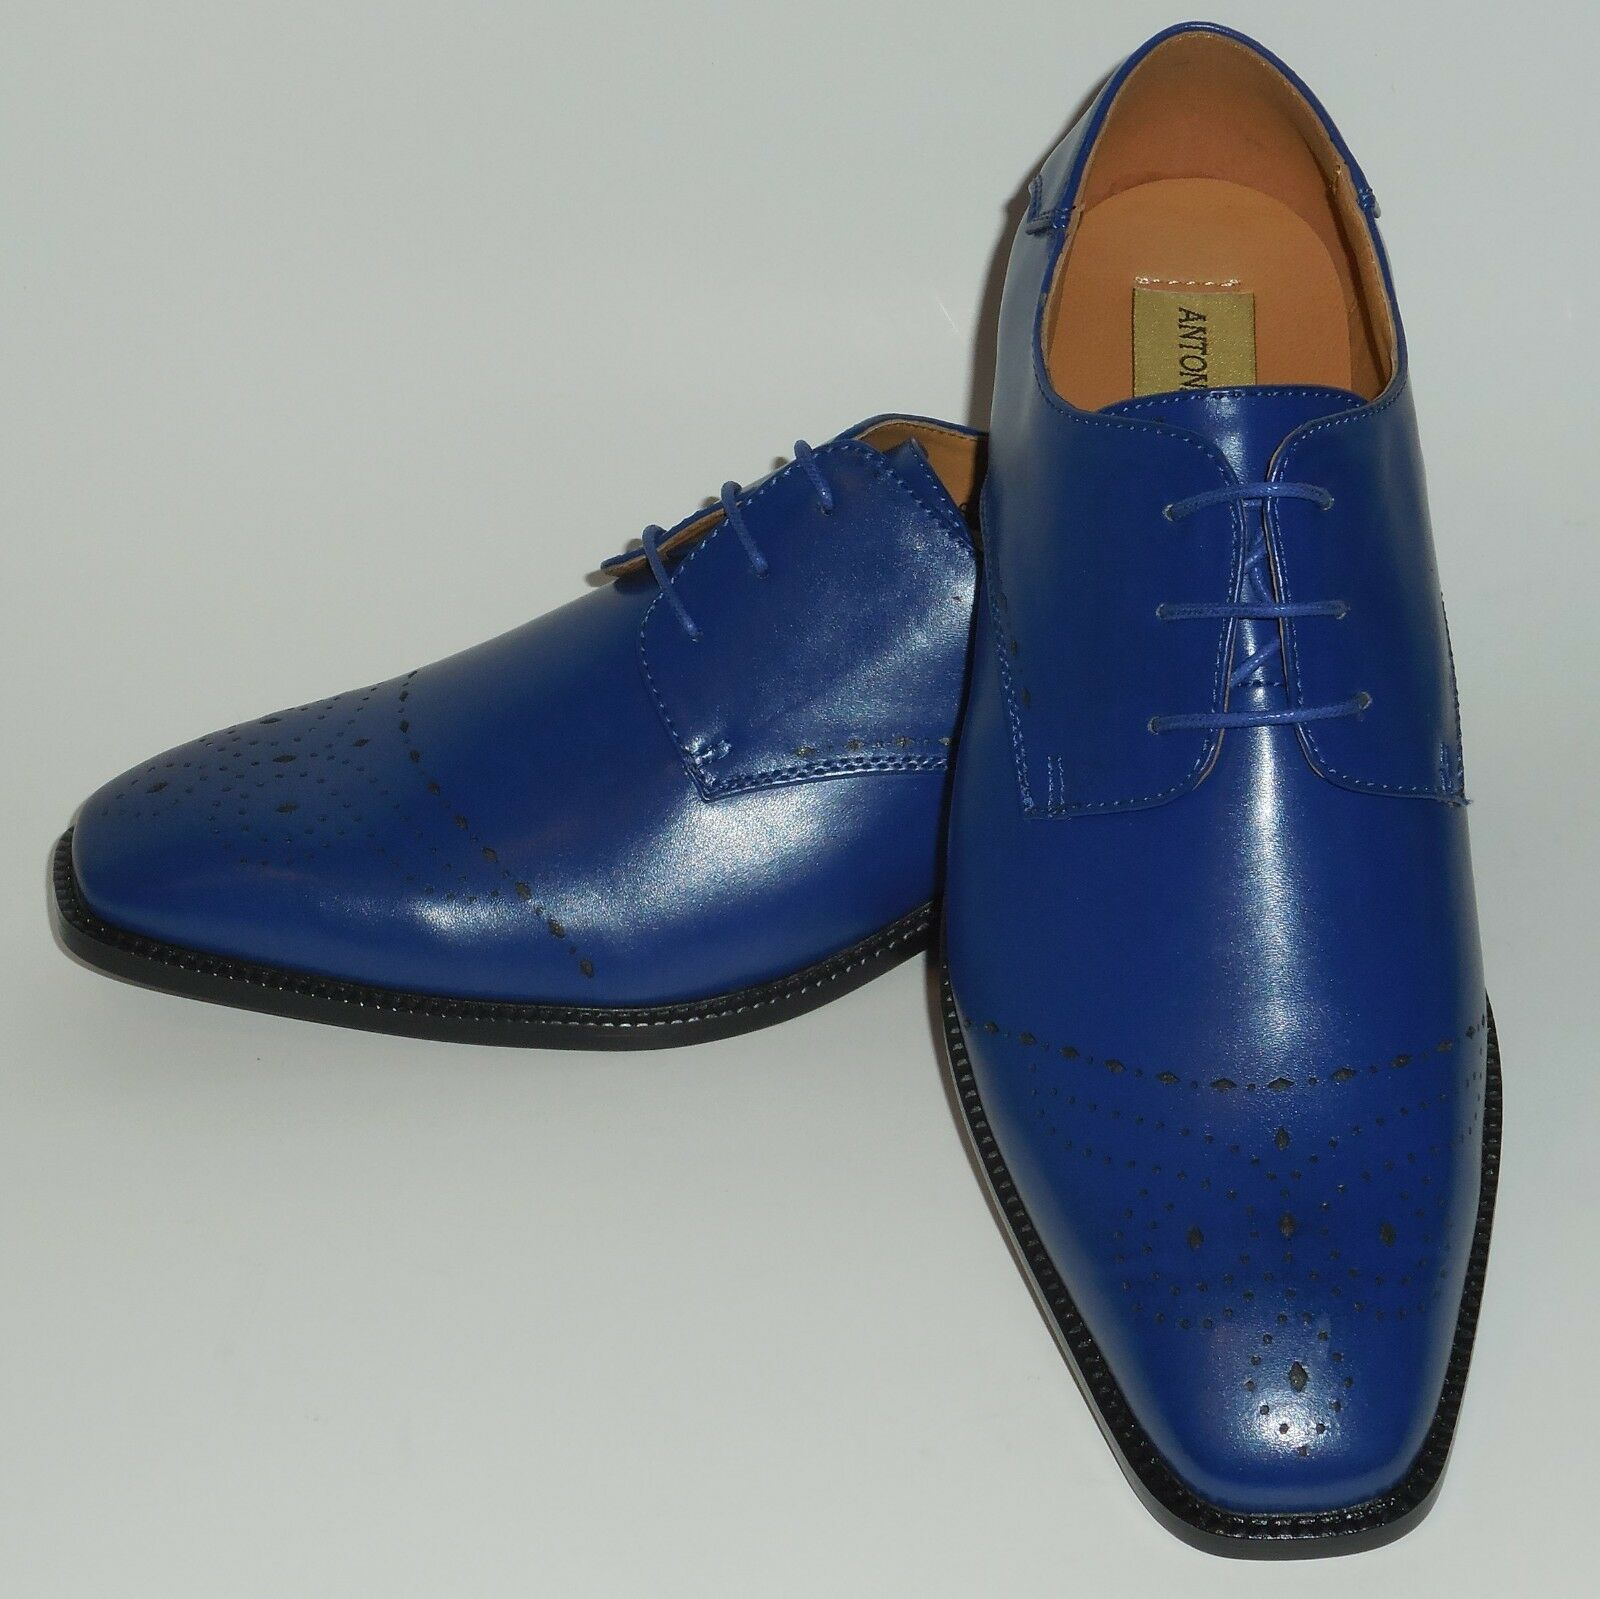 Uomo Cool Perforated Royal Blue Oxford Fashion Dress Scarpe Antonio Cerrelli 6738